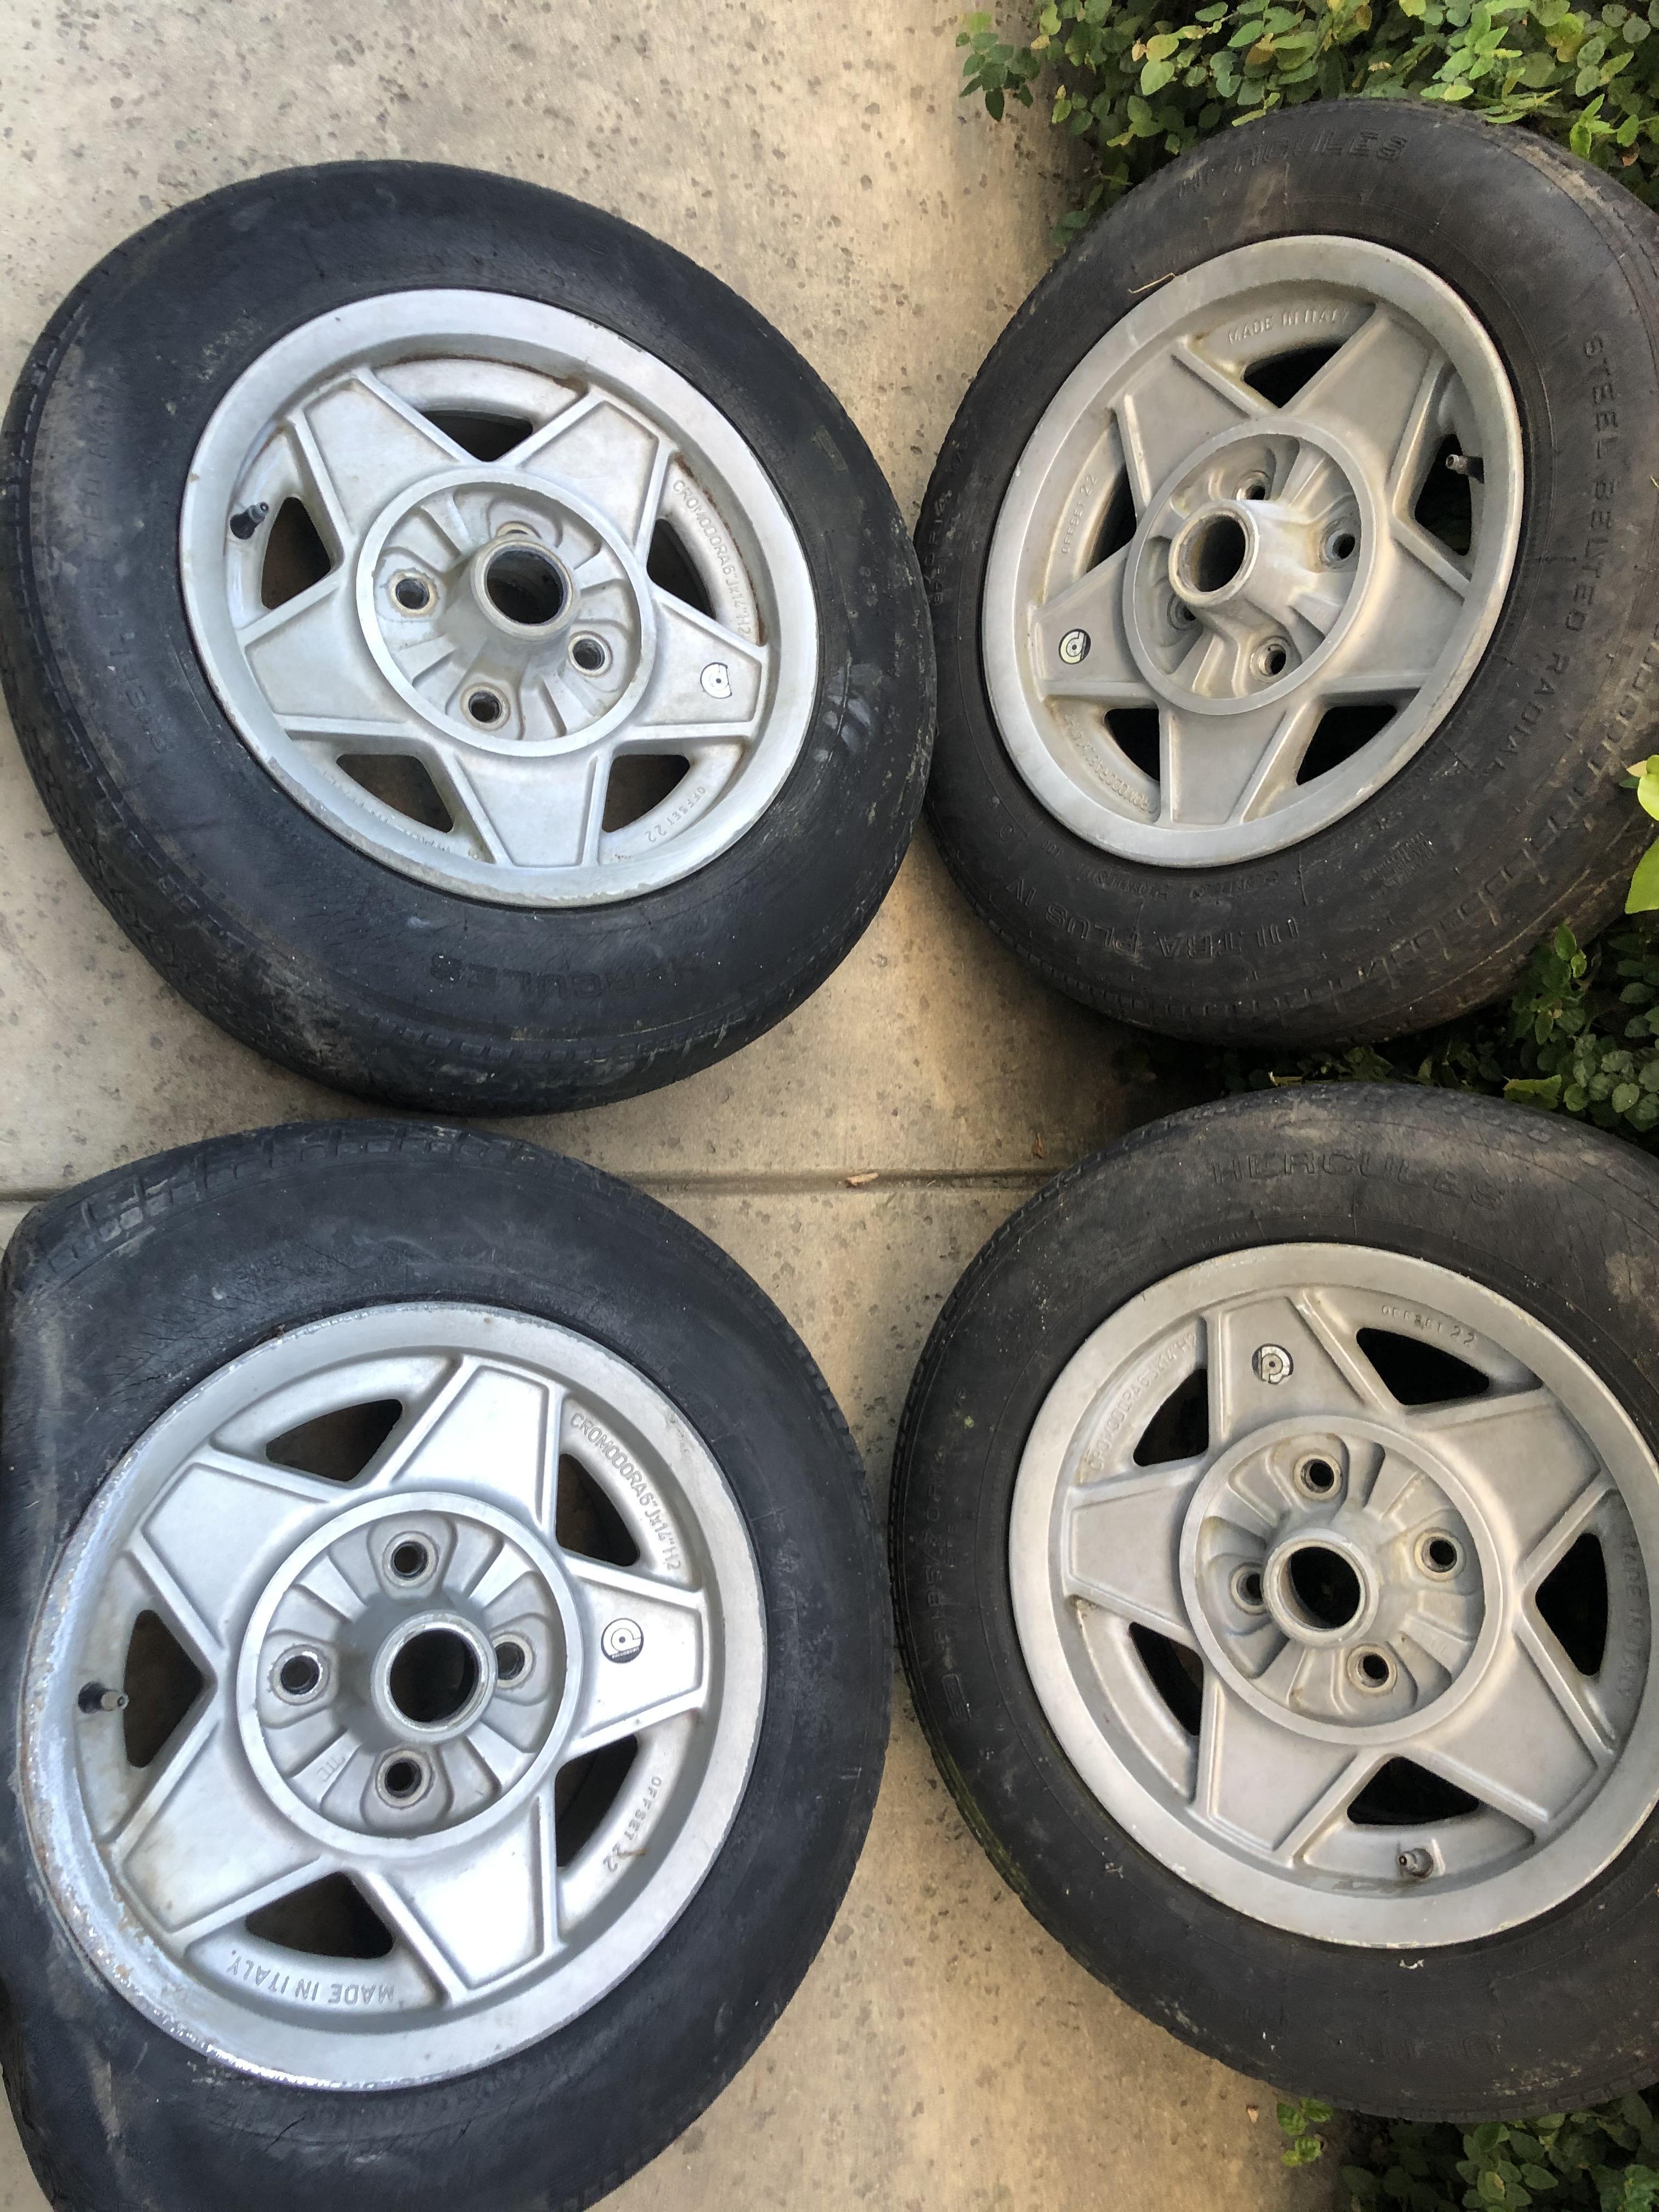 Cromodora Daytona wheels-Magnesium alloy